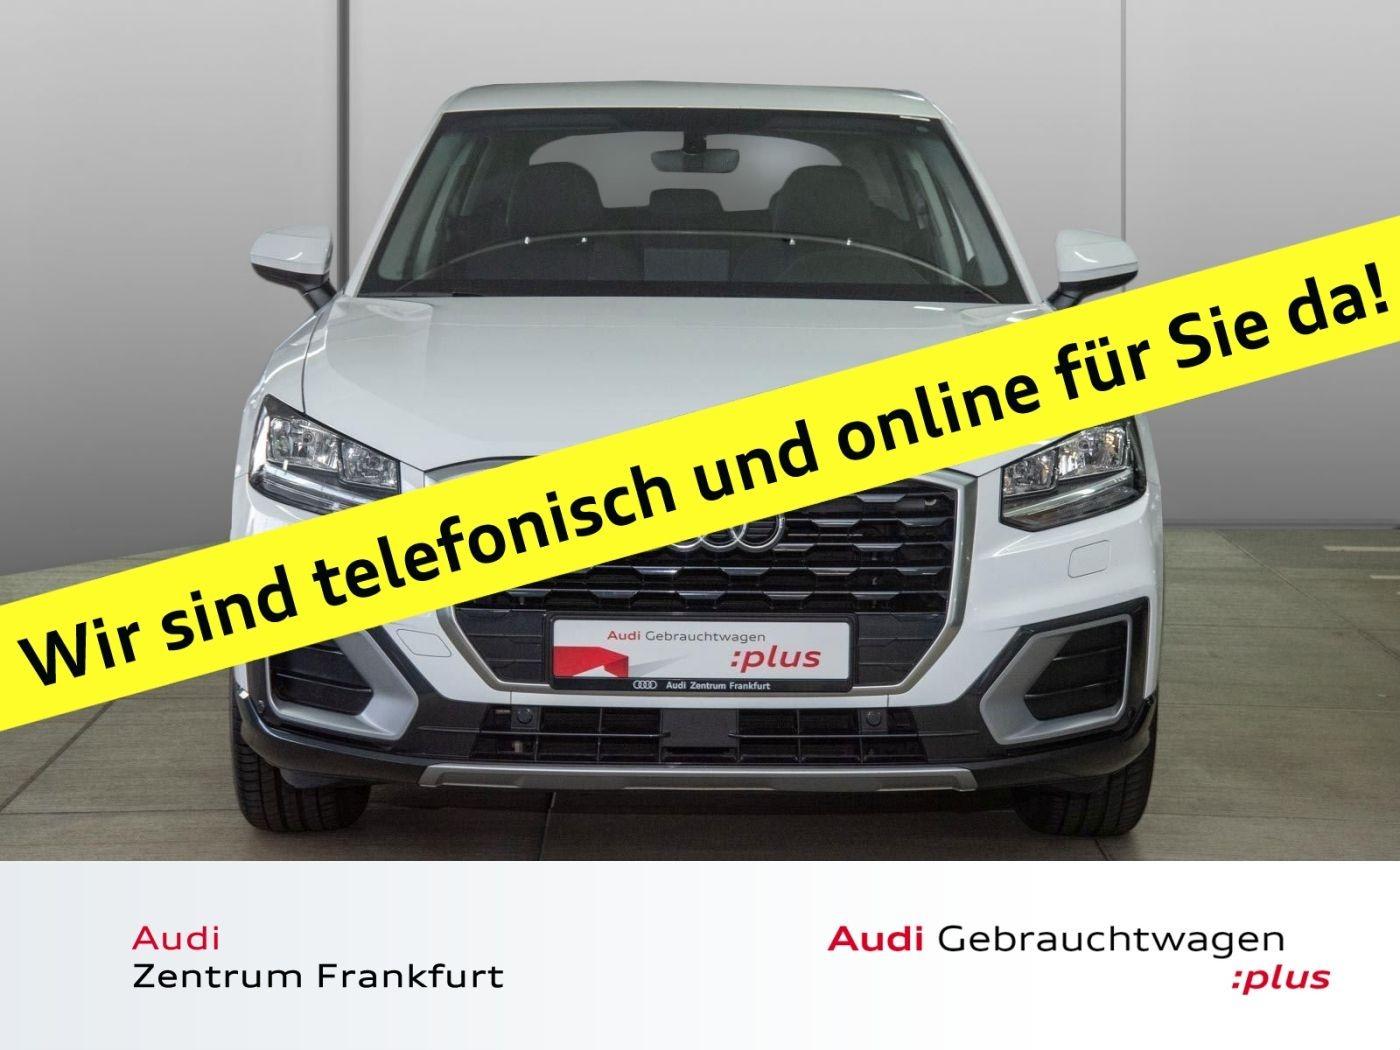 Audi Q2 1.0 TFSI ultra sport S tronic PDC Sitzheizung, Jahr 2017, Benzin